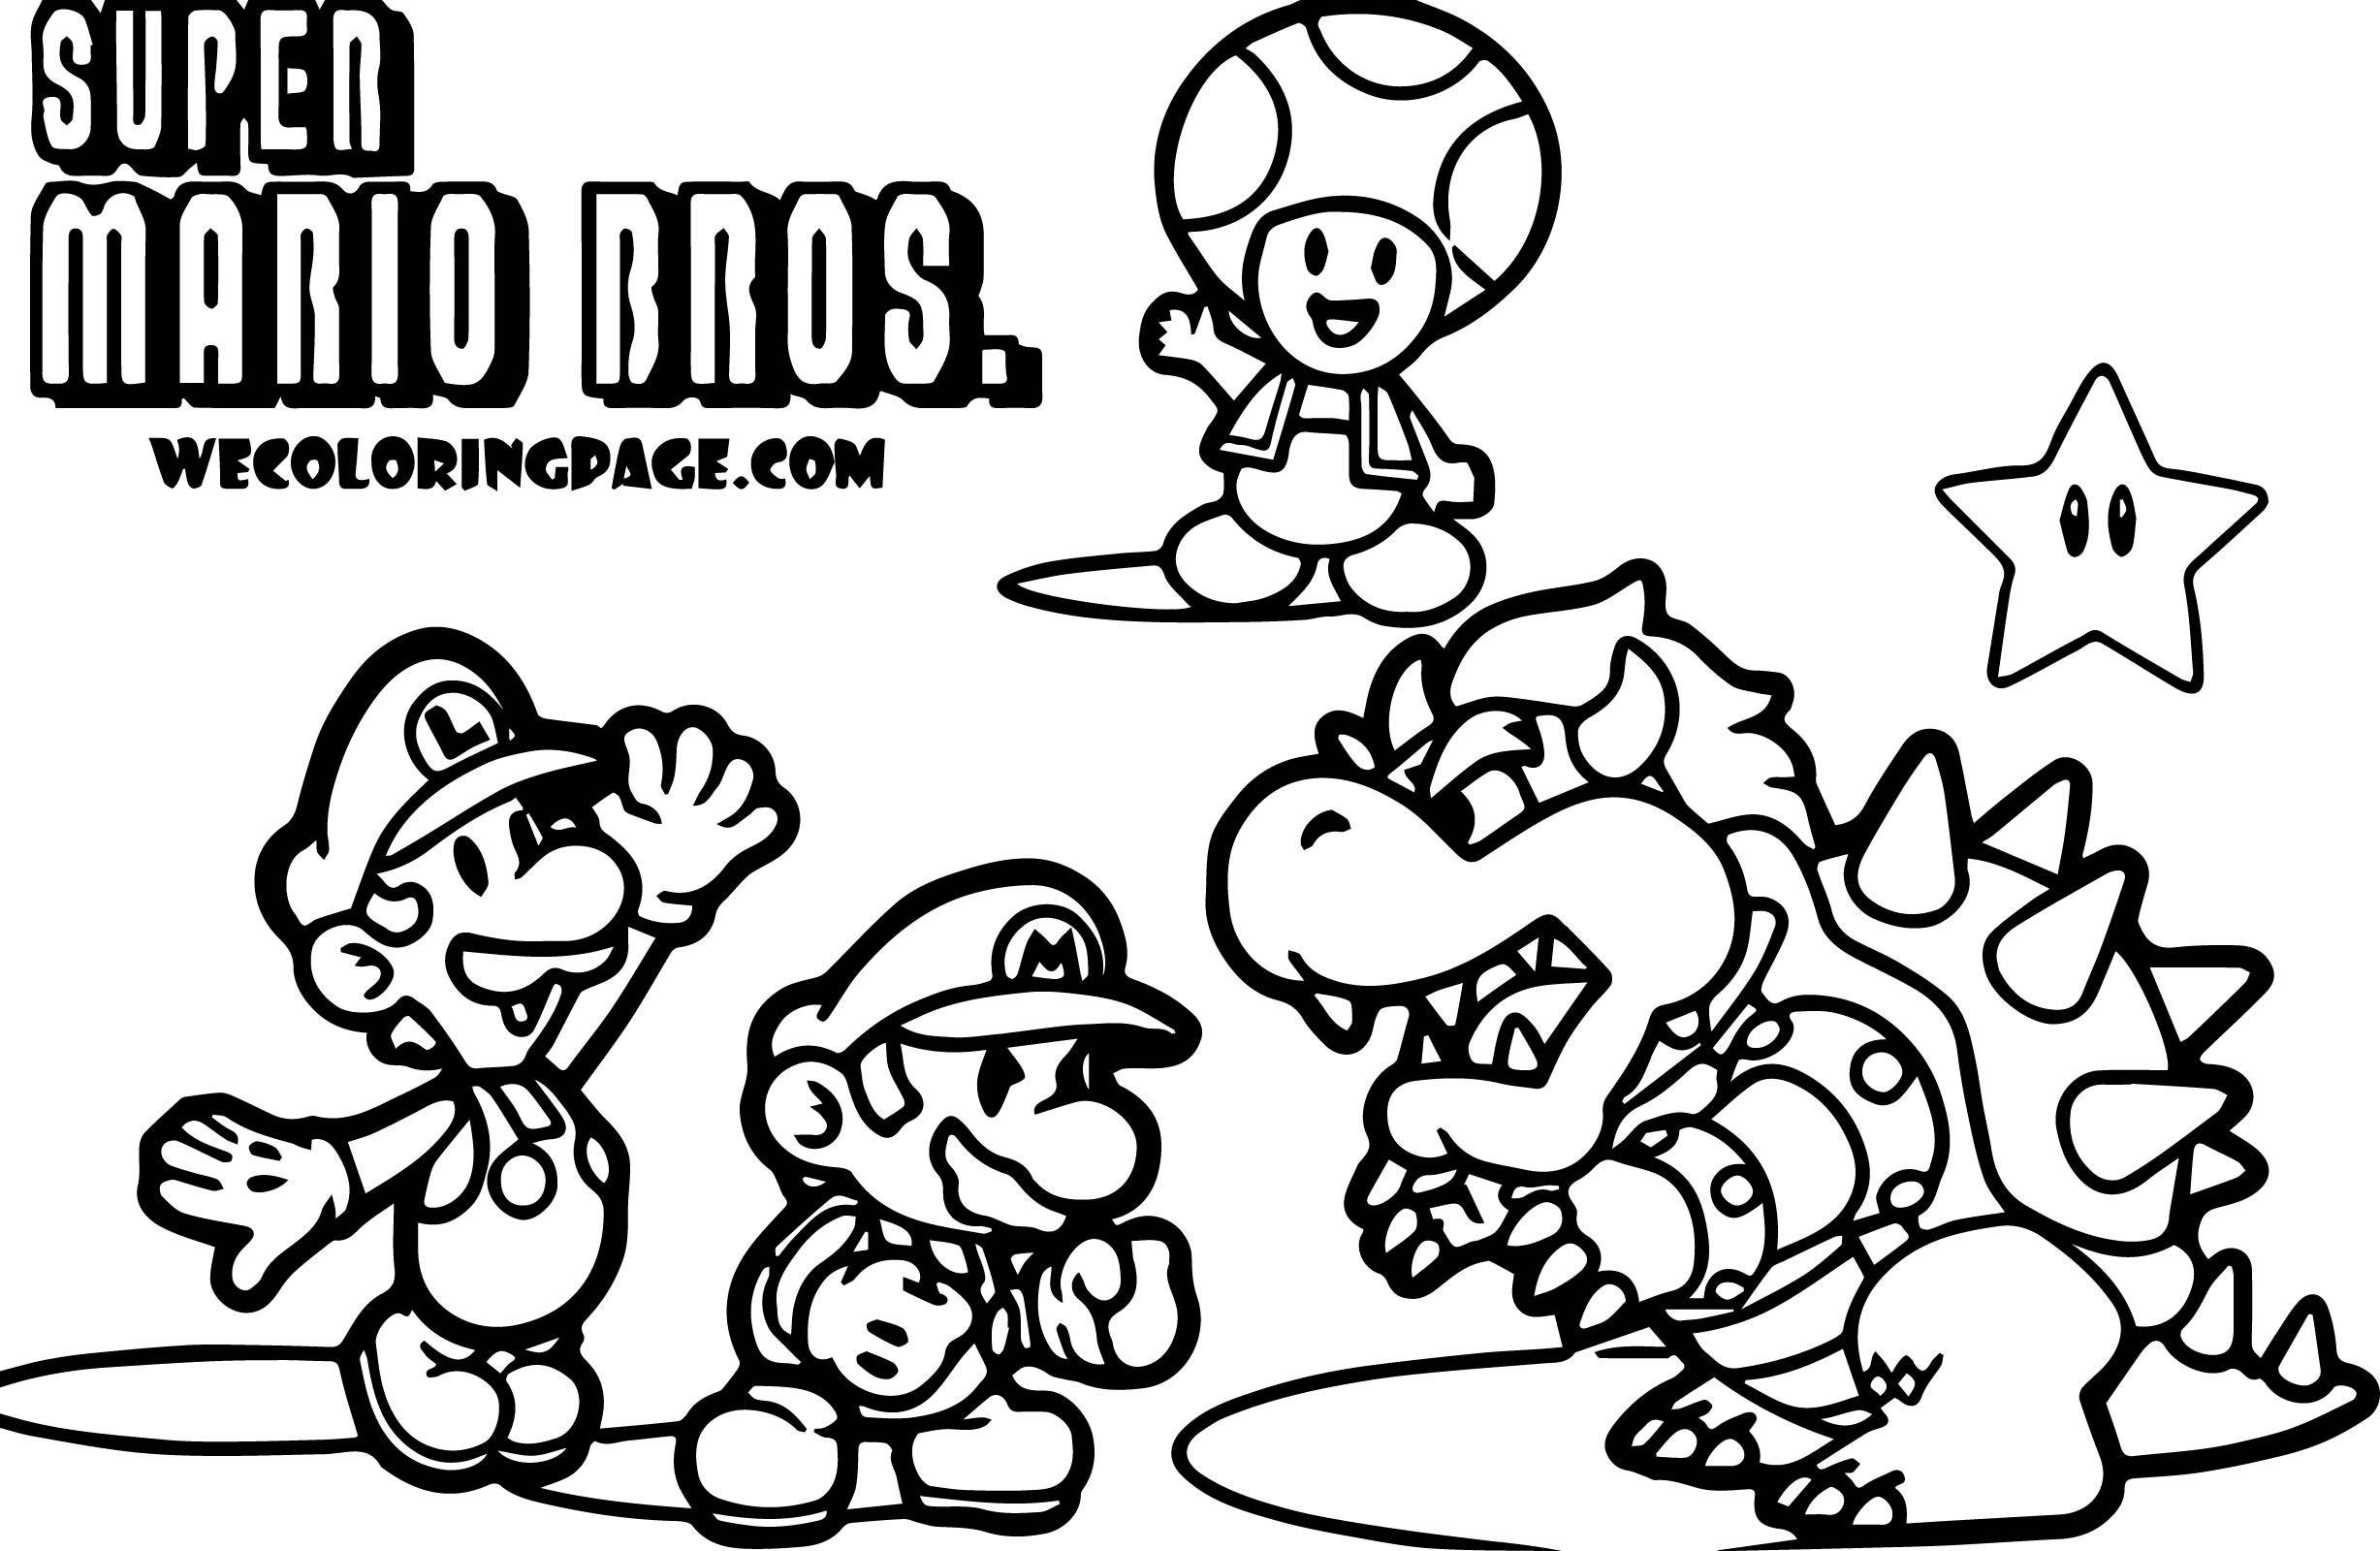 Ausmalbilder Mario Kart Genial Awesome 44 Ausmalbilder Mario Coloring Pages Frisch Ausmalbilder Das Bild